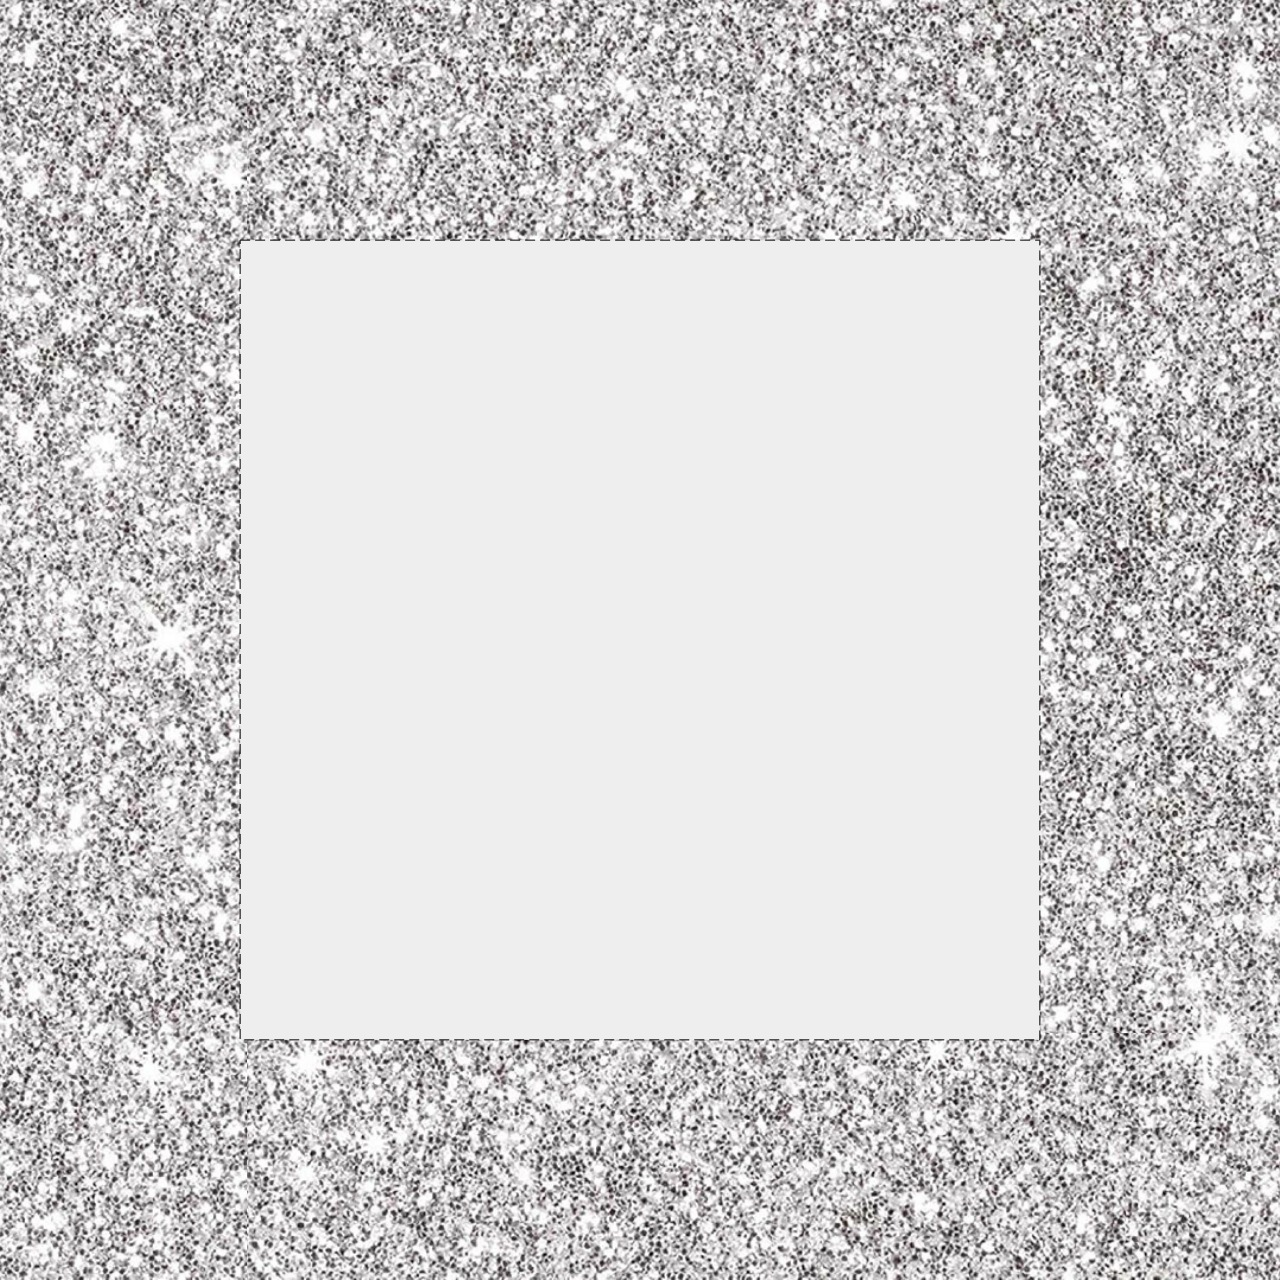 Instagram Border Template: Glitter Silver.